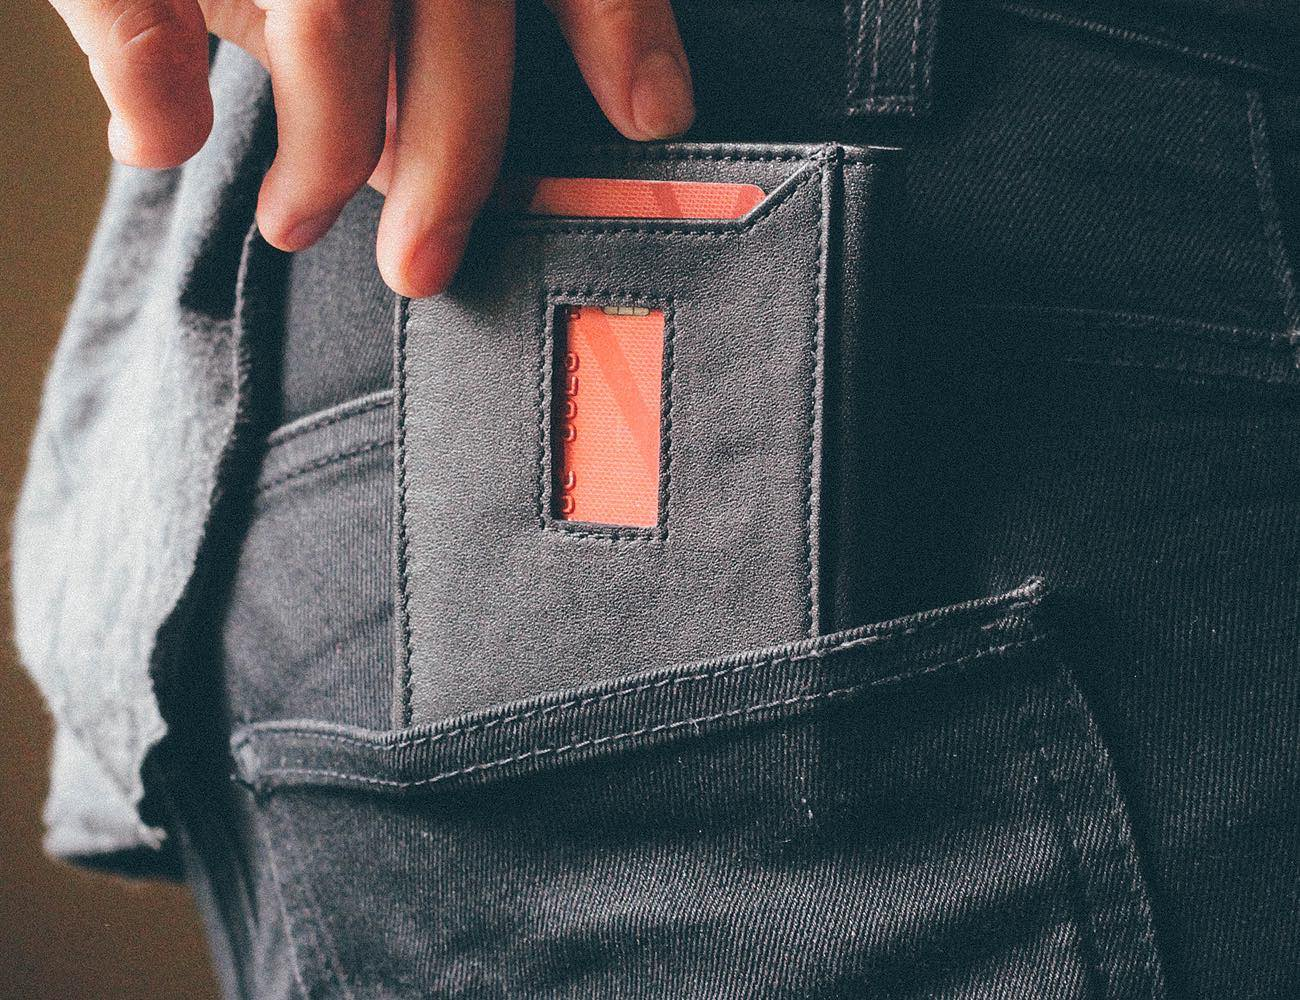 MostRad Minimalist Wallet (RFID Protection)